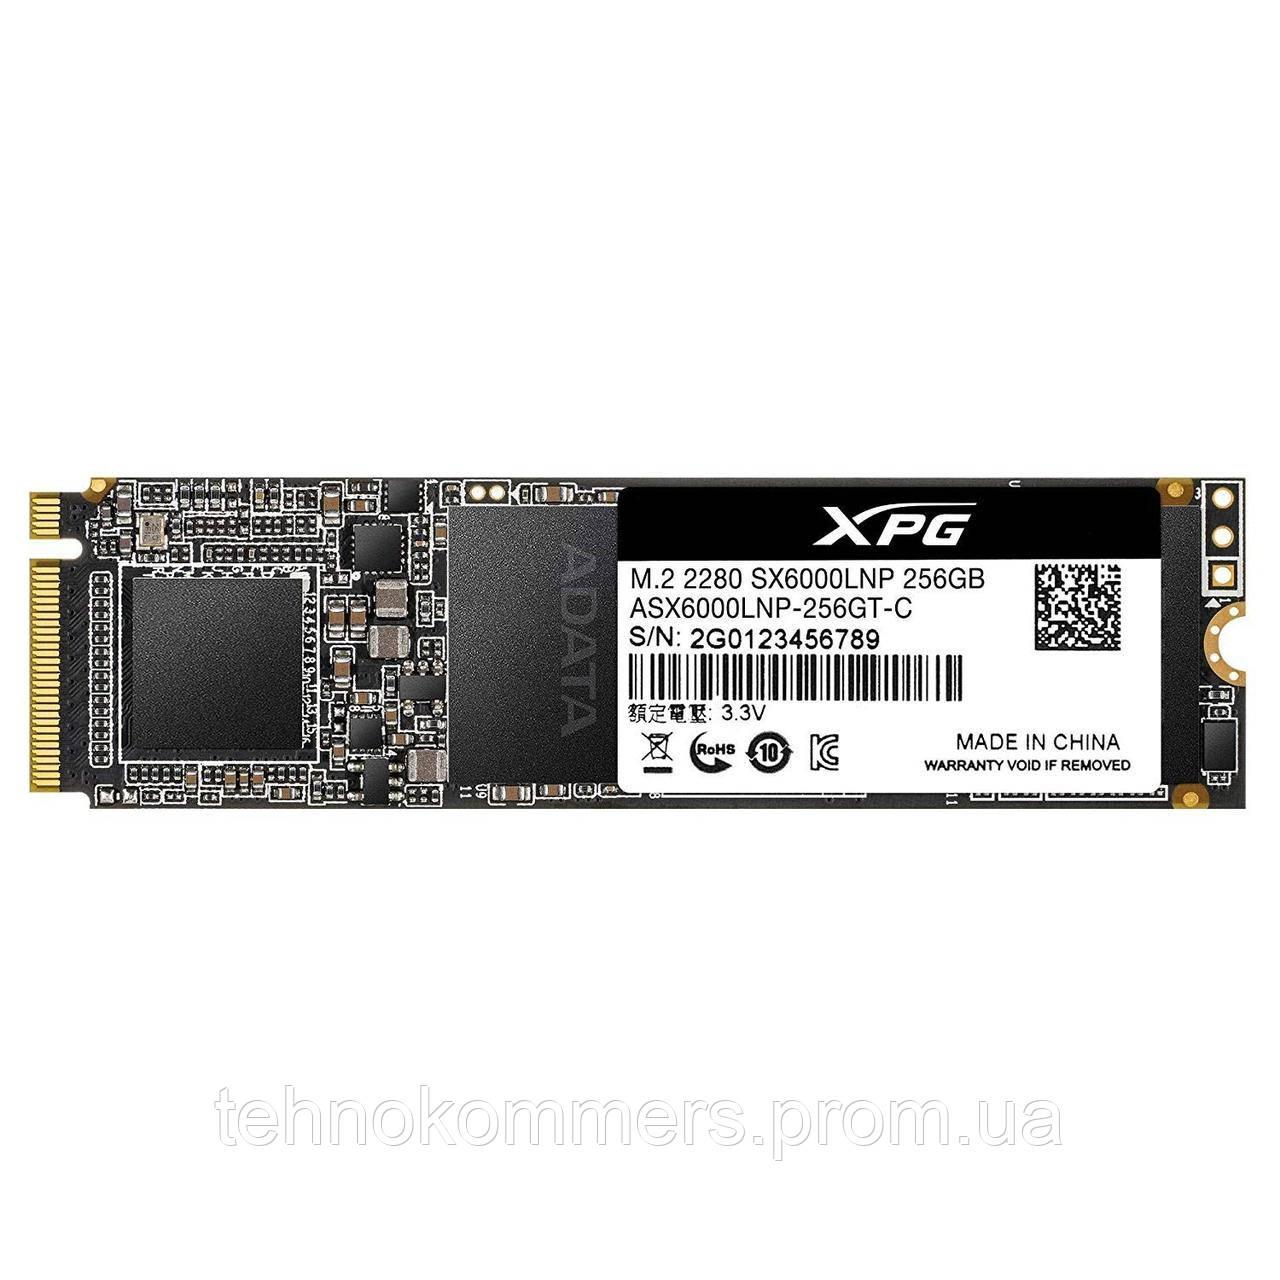 Накопичувач SSD A-DATA XPG SX6000 Lite 256GB M.2 PCI Express 3.0x4 3D NAND TLC